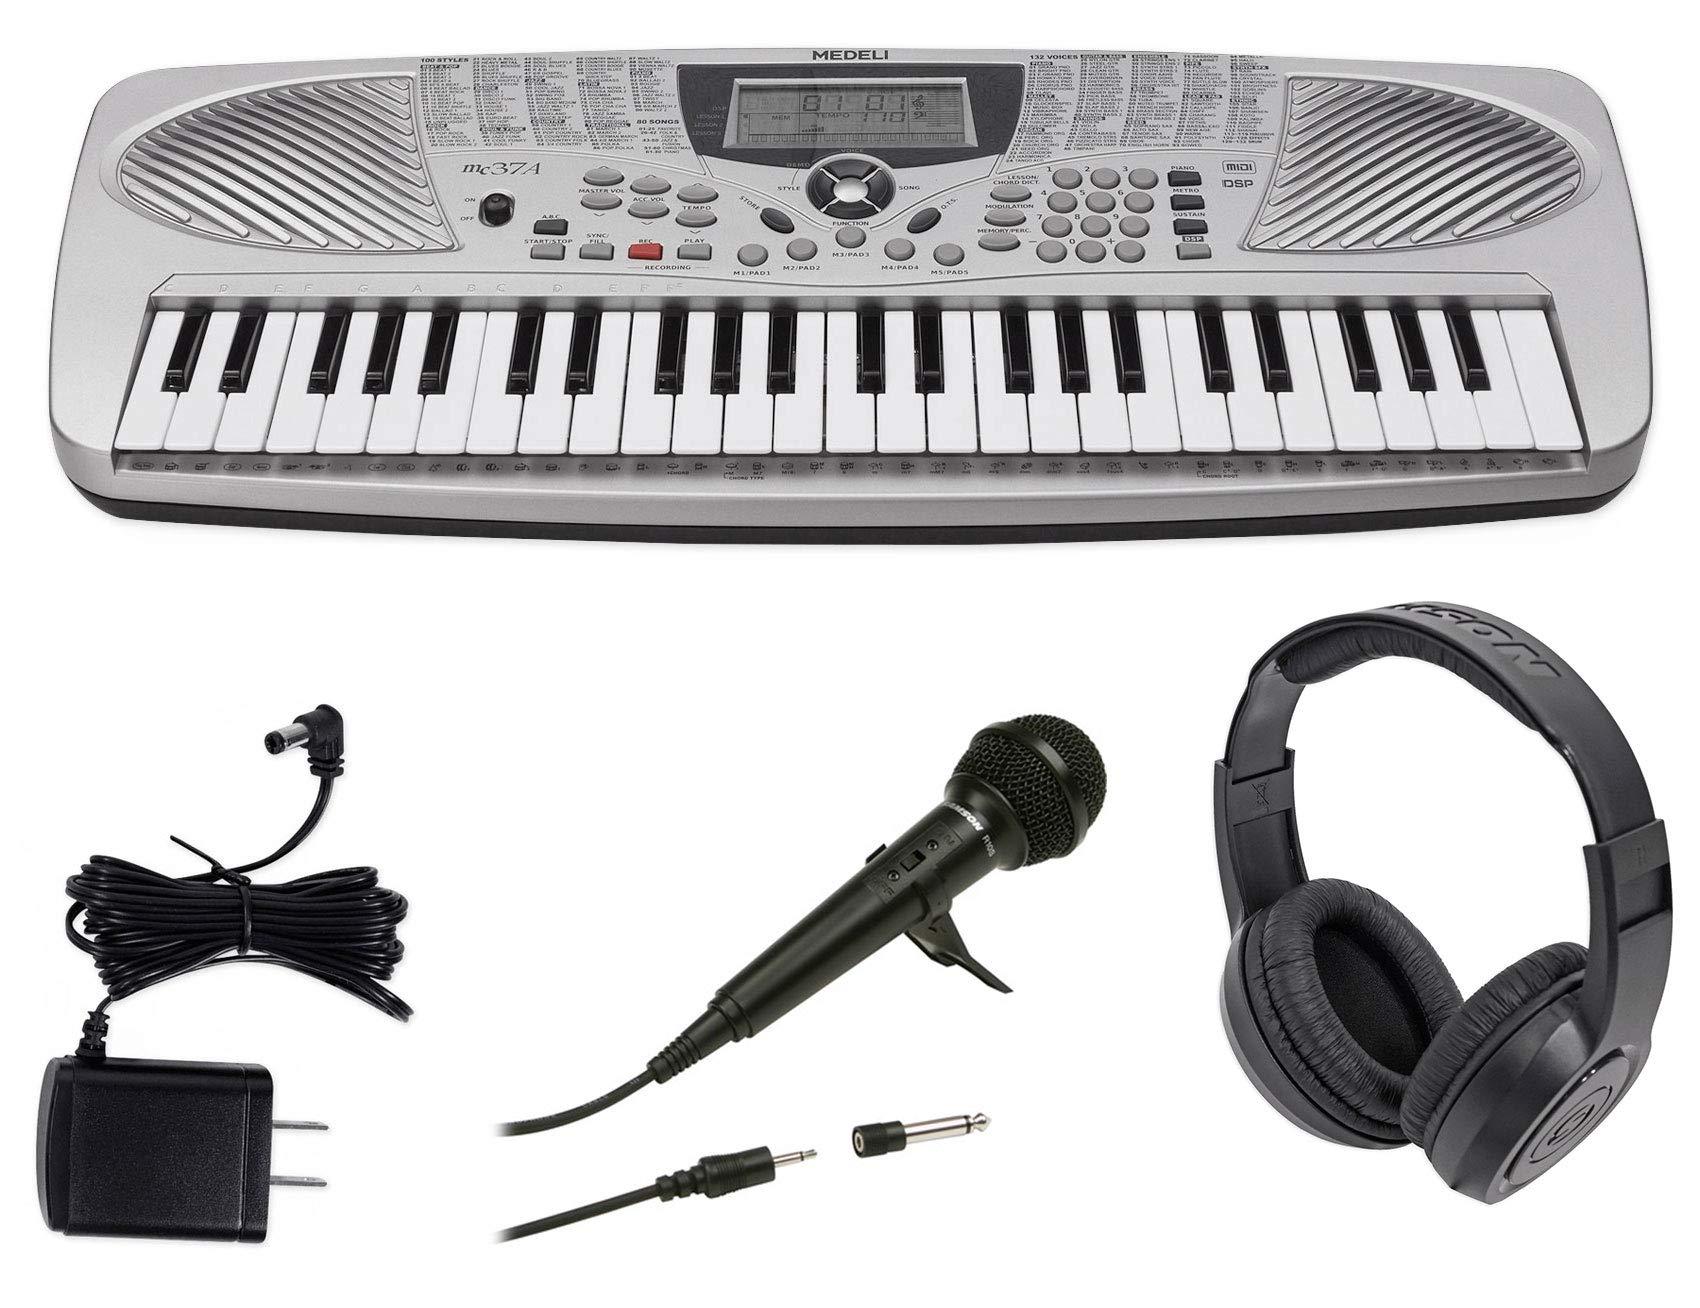 MEDELI MC37A 49-Key Portable USB Keyboard+Power Supply+Microphone+Headphones